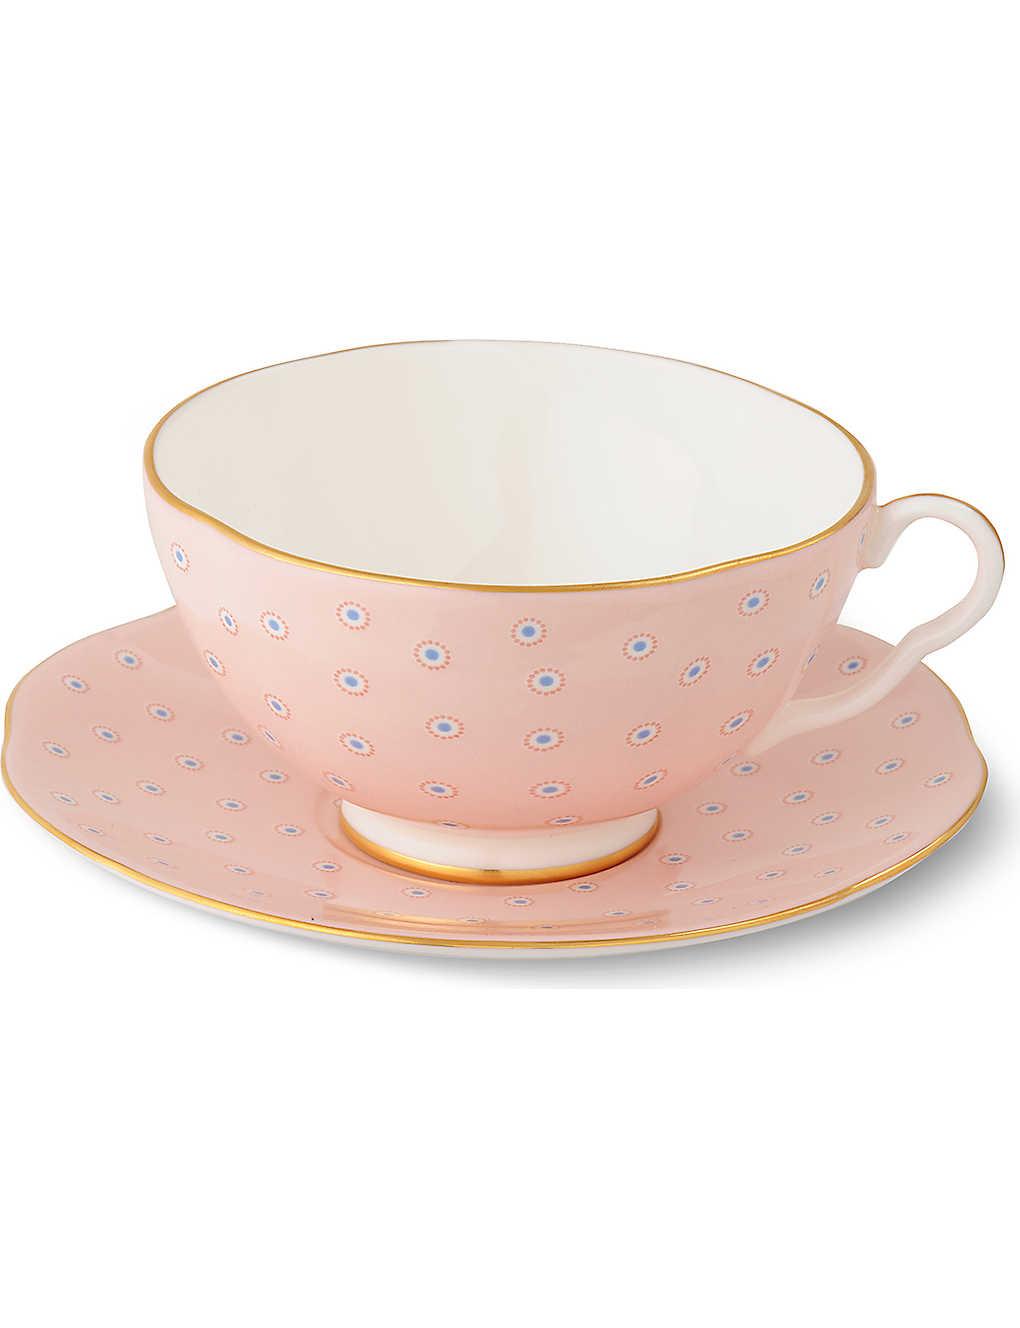 WEDGWOOD - Polka Dot Tea Story teacup and saucer | Selfridges.com